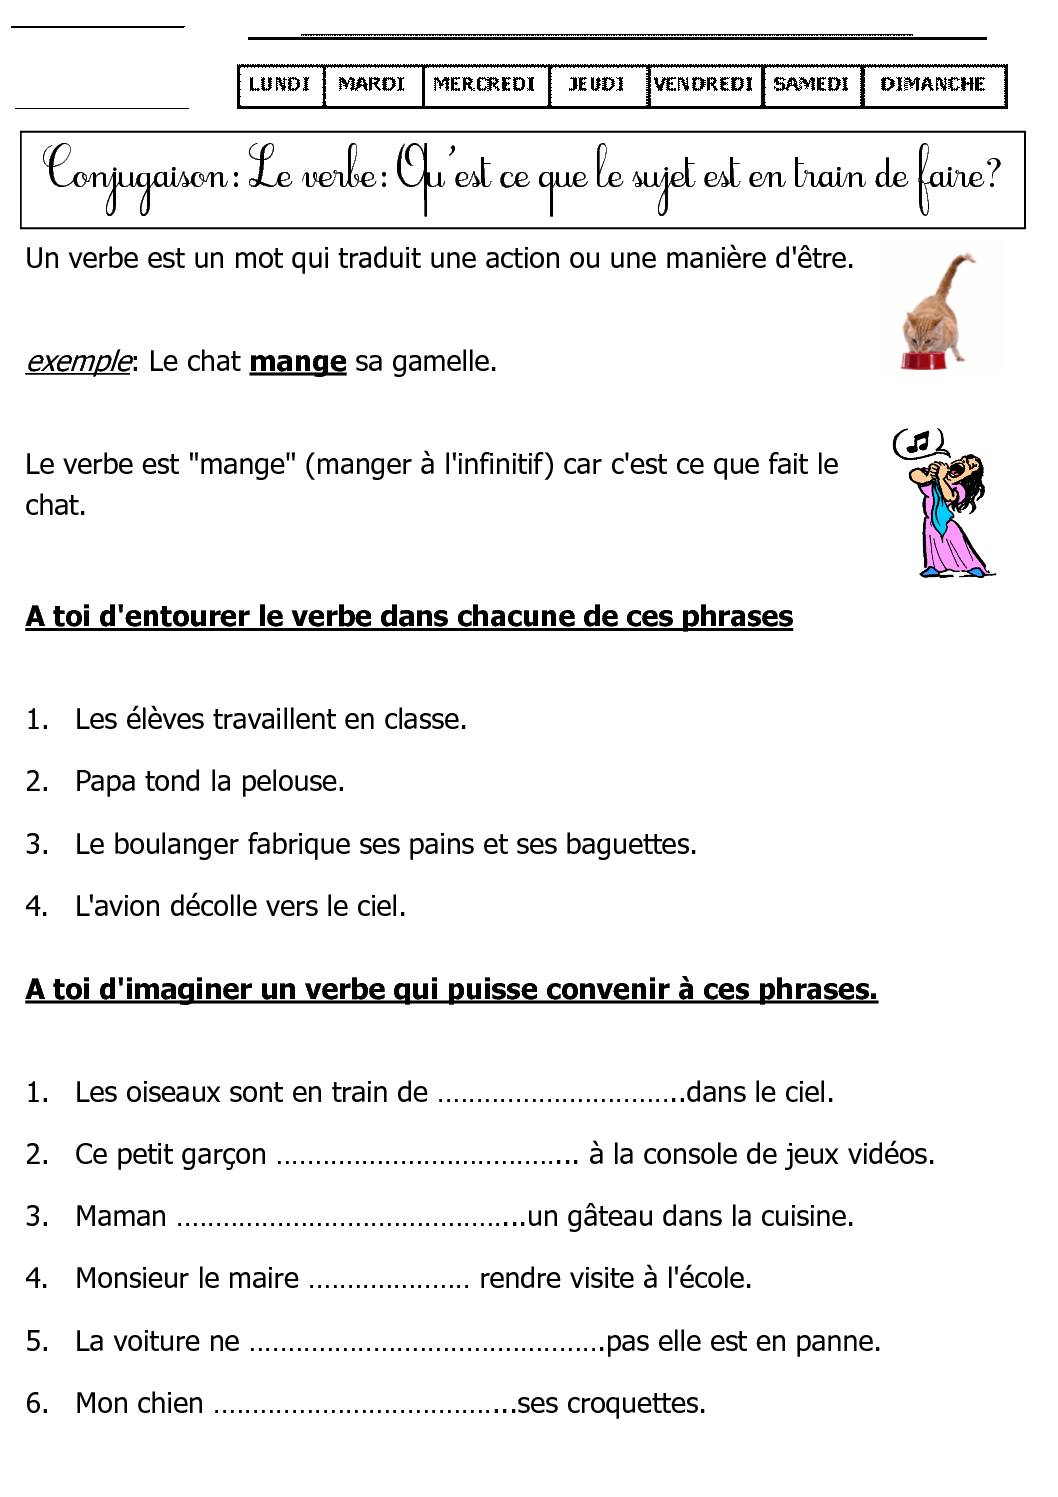 15 regles de conjugaison pdf